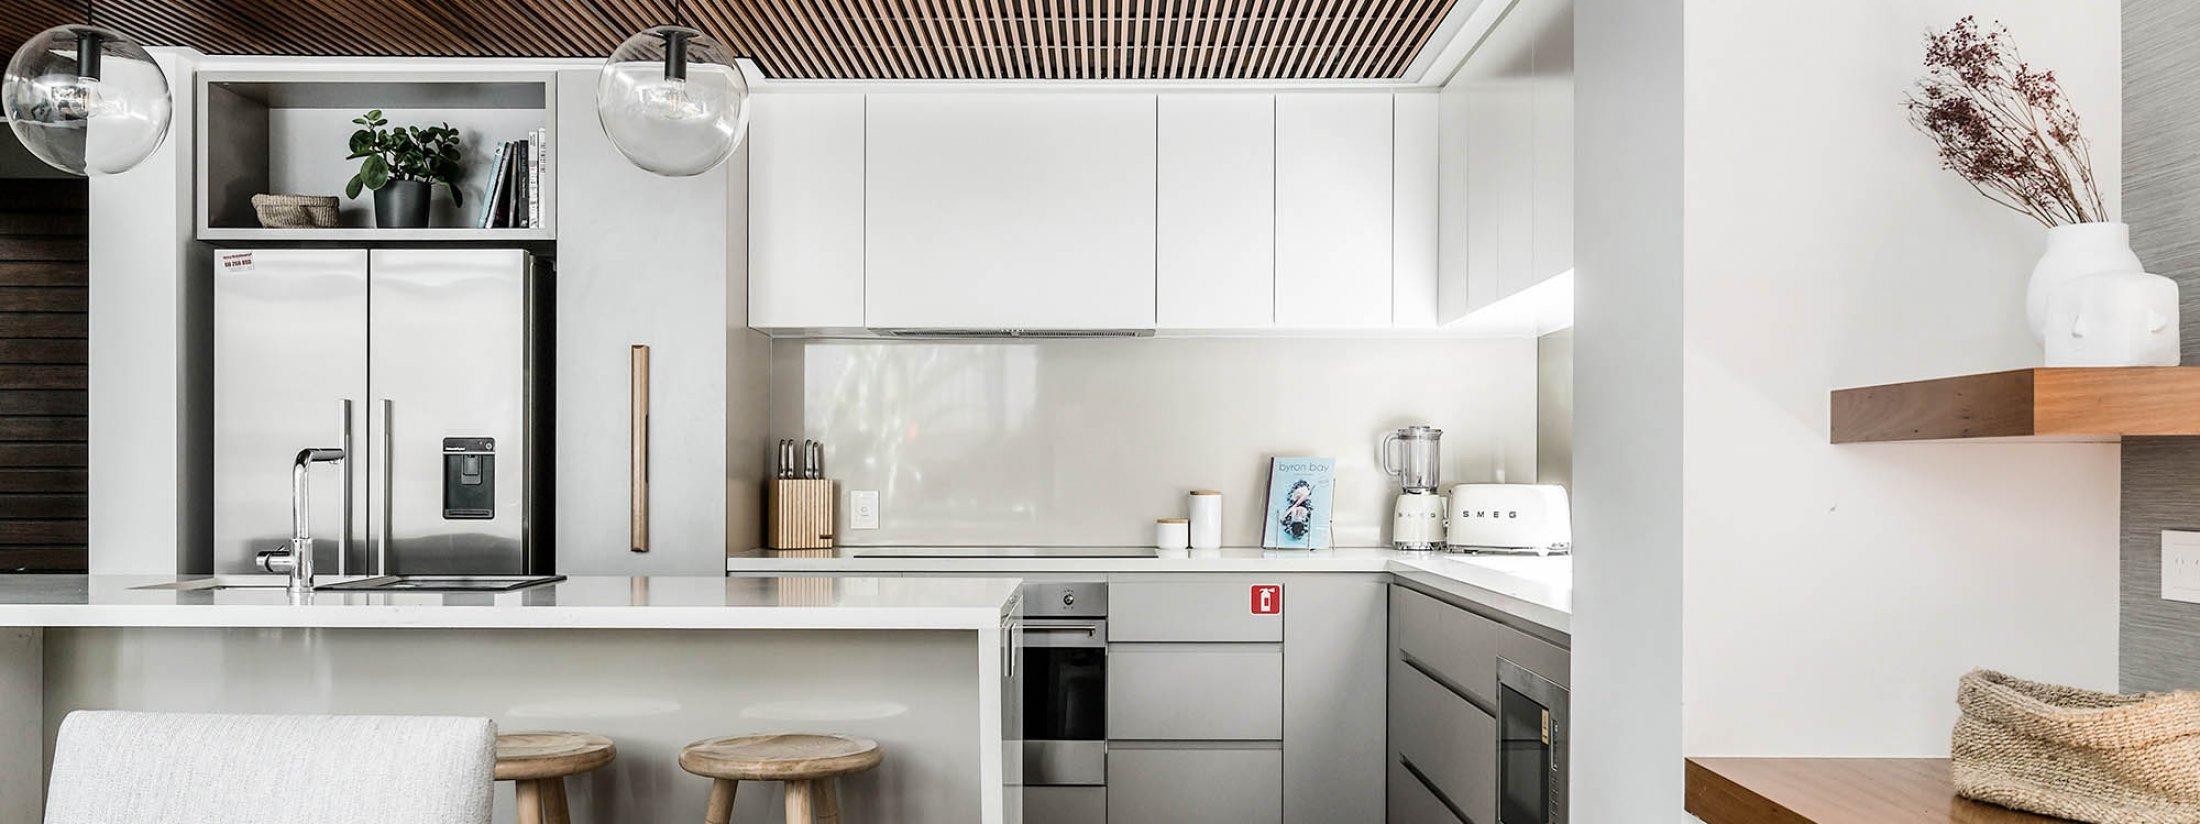 Kokos Beach House 1 - Byron Bay - Kitchen